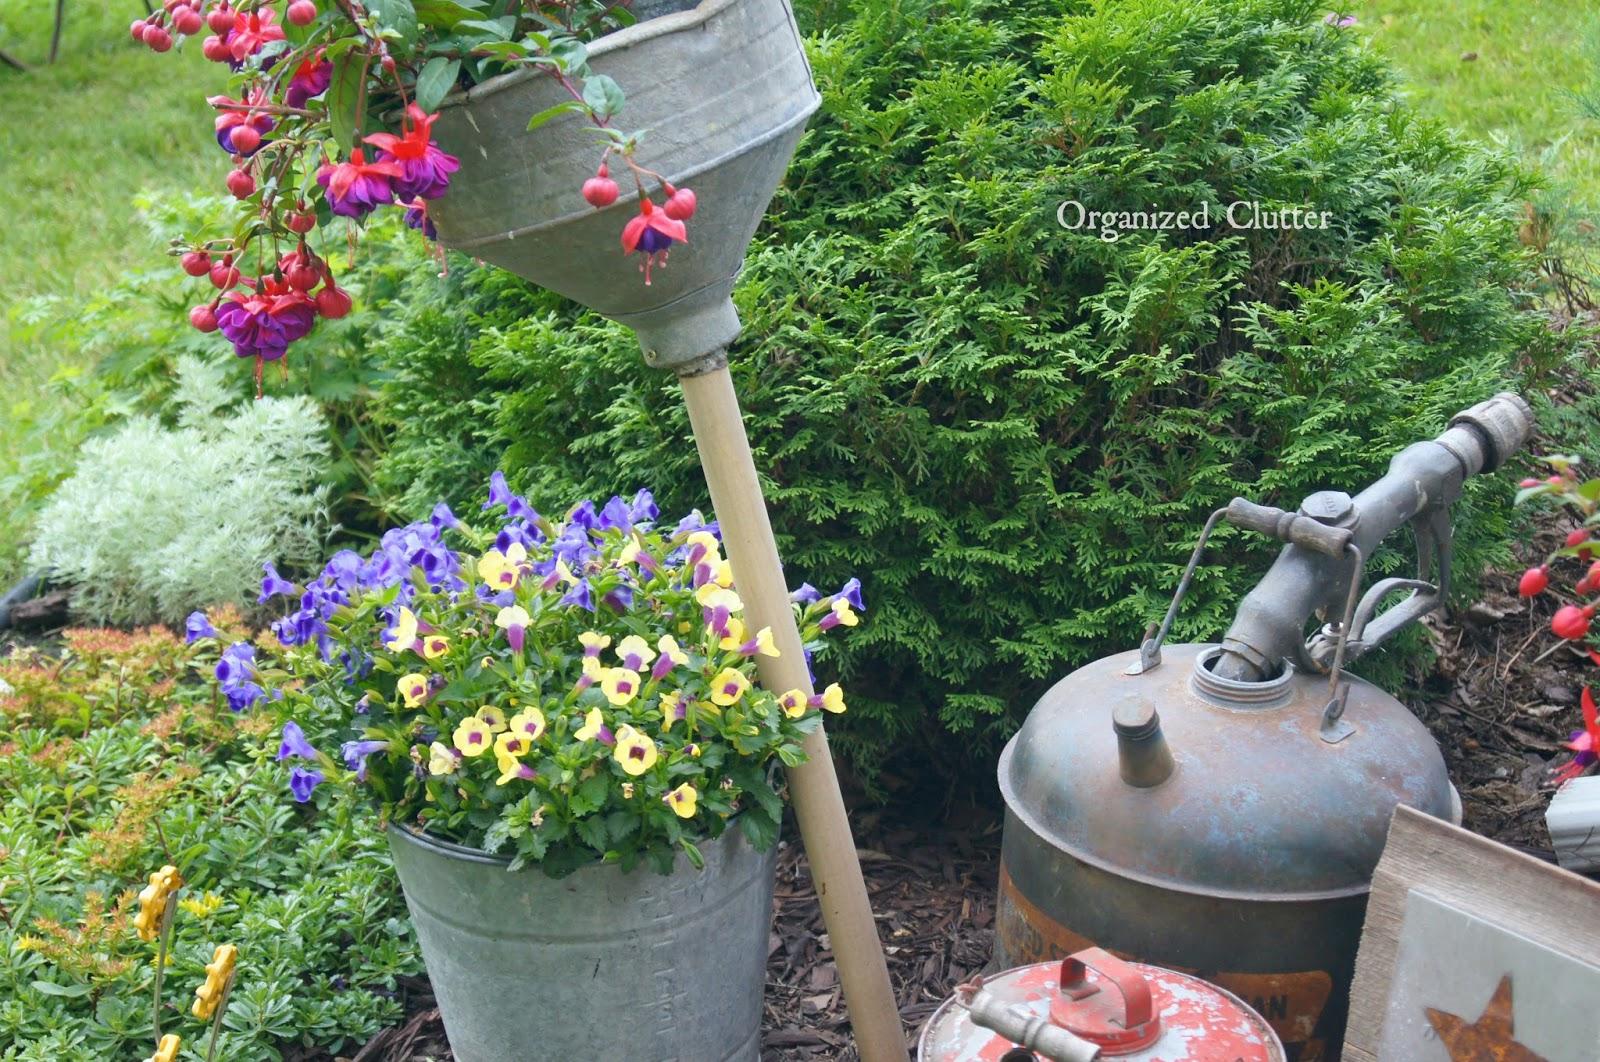 Oil Cans, Funnels & Gas Nozzle www.organizedclutterqueen.blogspot.com